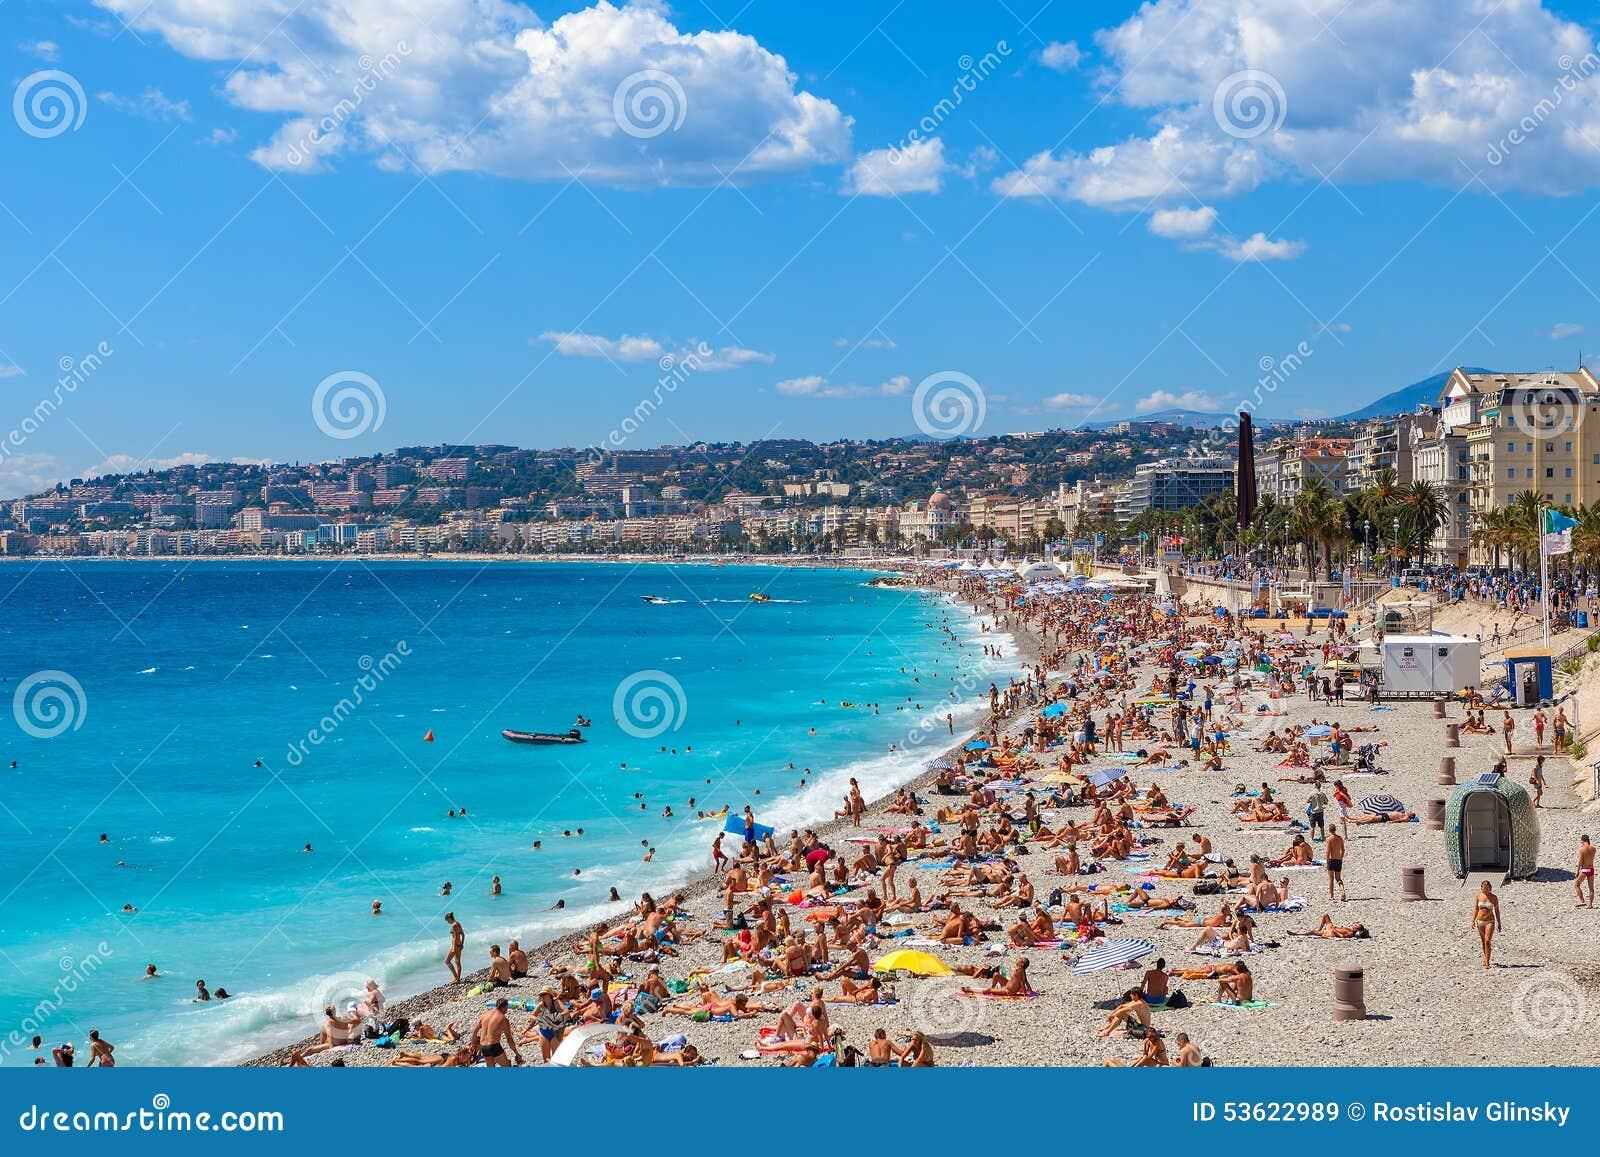 Beach Resorts Near Alicante